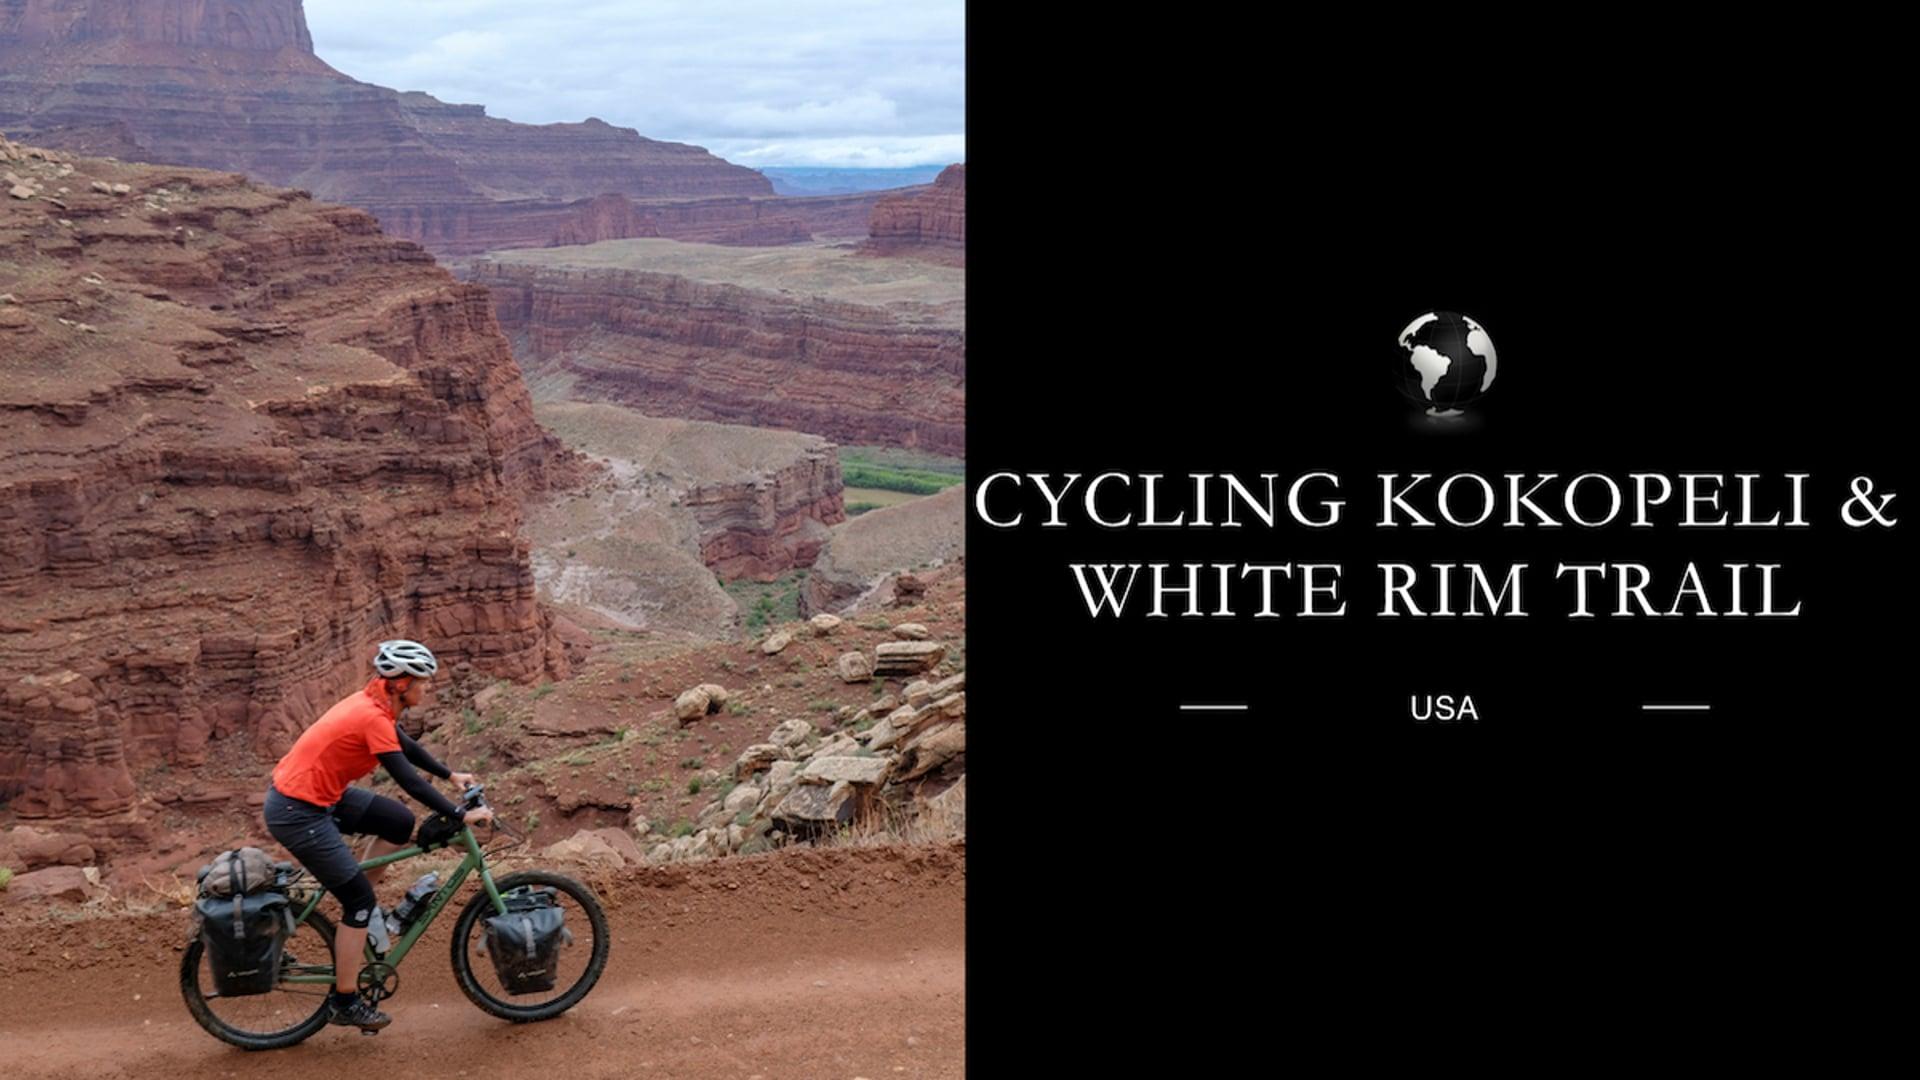 Cycling Kokopelli trail and White Rim trail USA